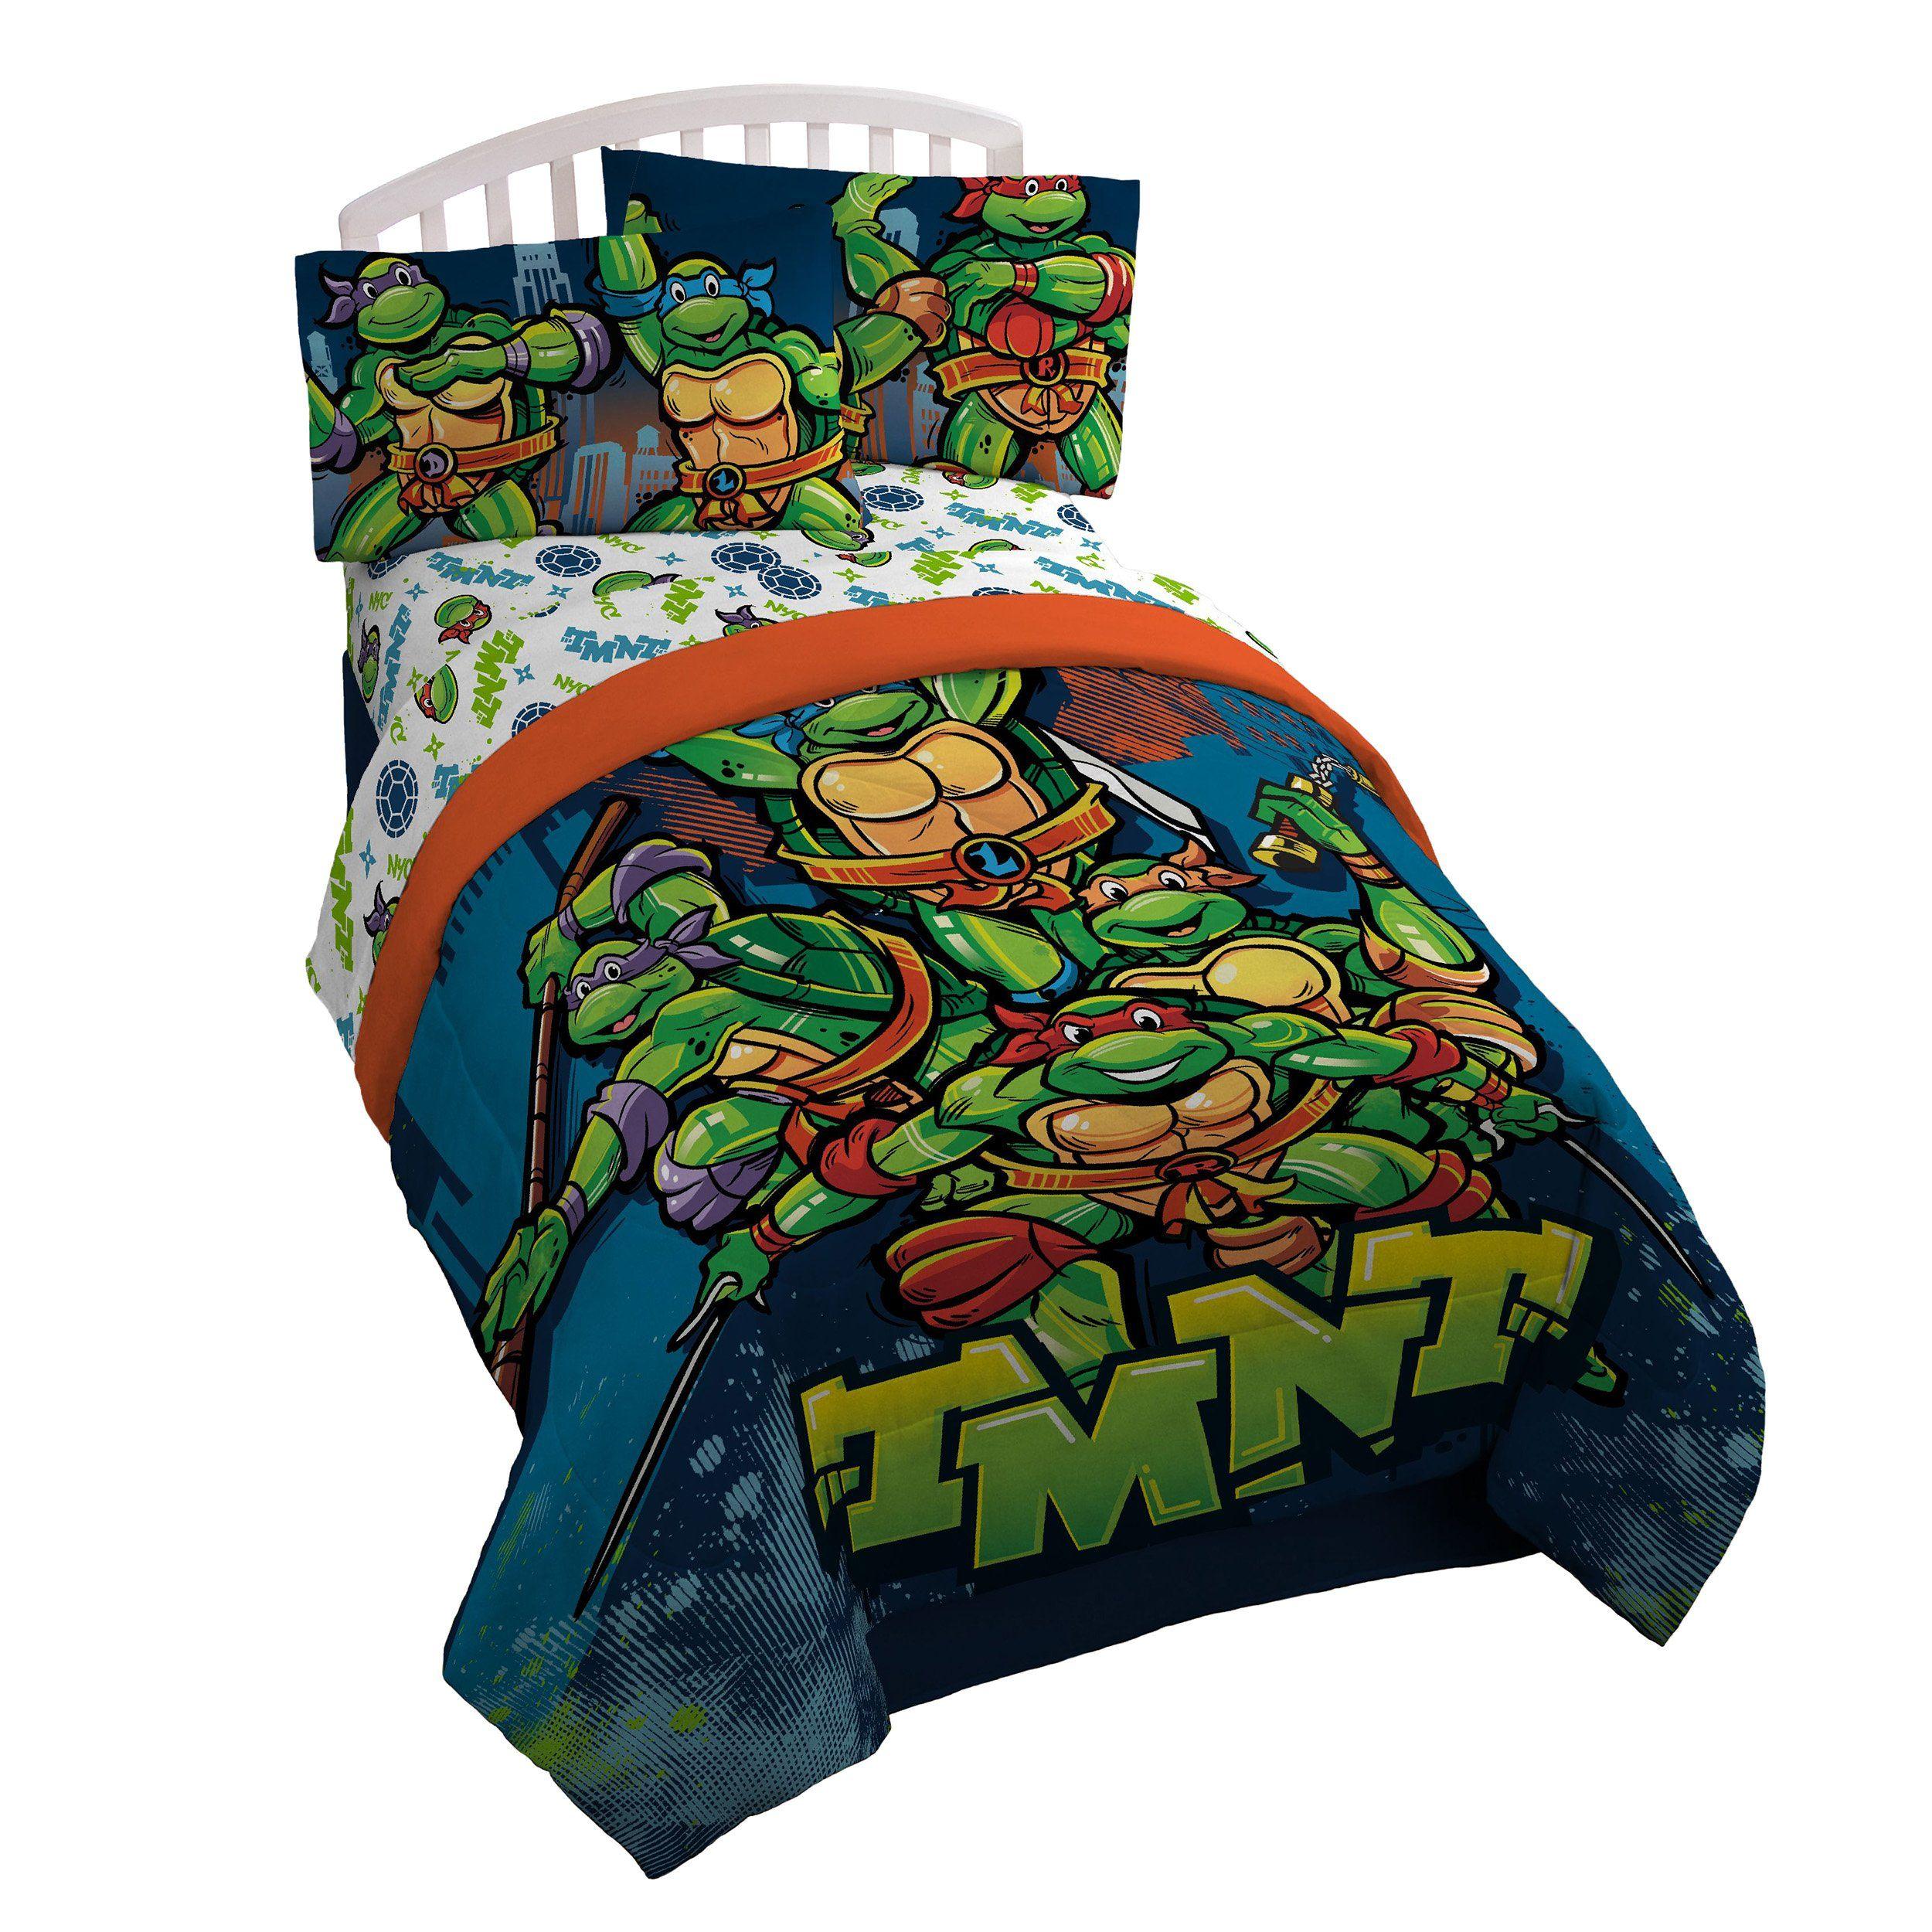 Nickelodeon Teenage Mutant Ninja Turtles Twin Full Reversible Comforter Click Imag Teenage Mutant Ninja Turtles Bedroom Ninja Turtle Bedroom Turtle Bedroom